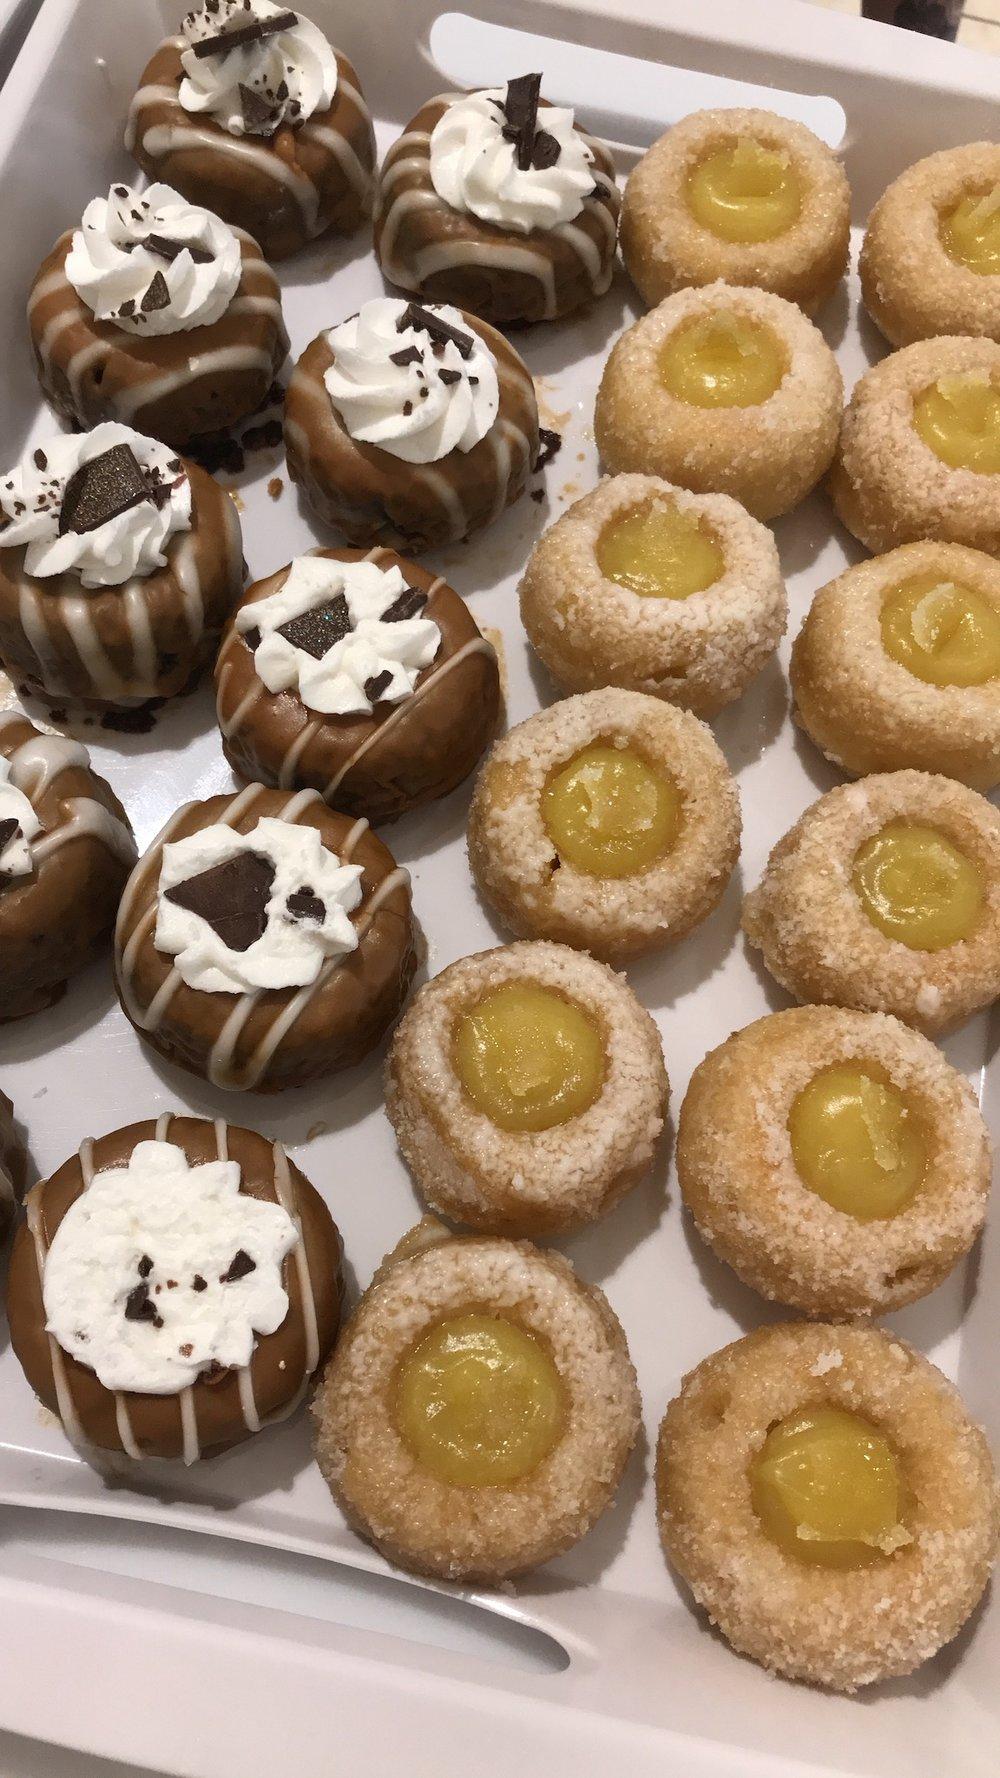 toronto-life-doughnut-festival-2018-dufferin-mall-sorelle-and-co.JPG